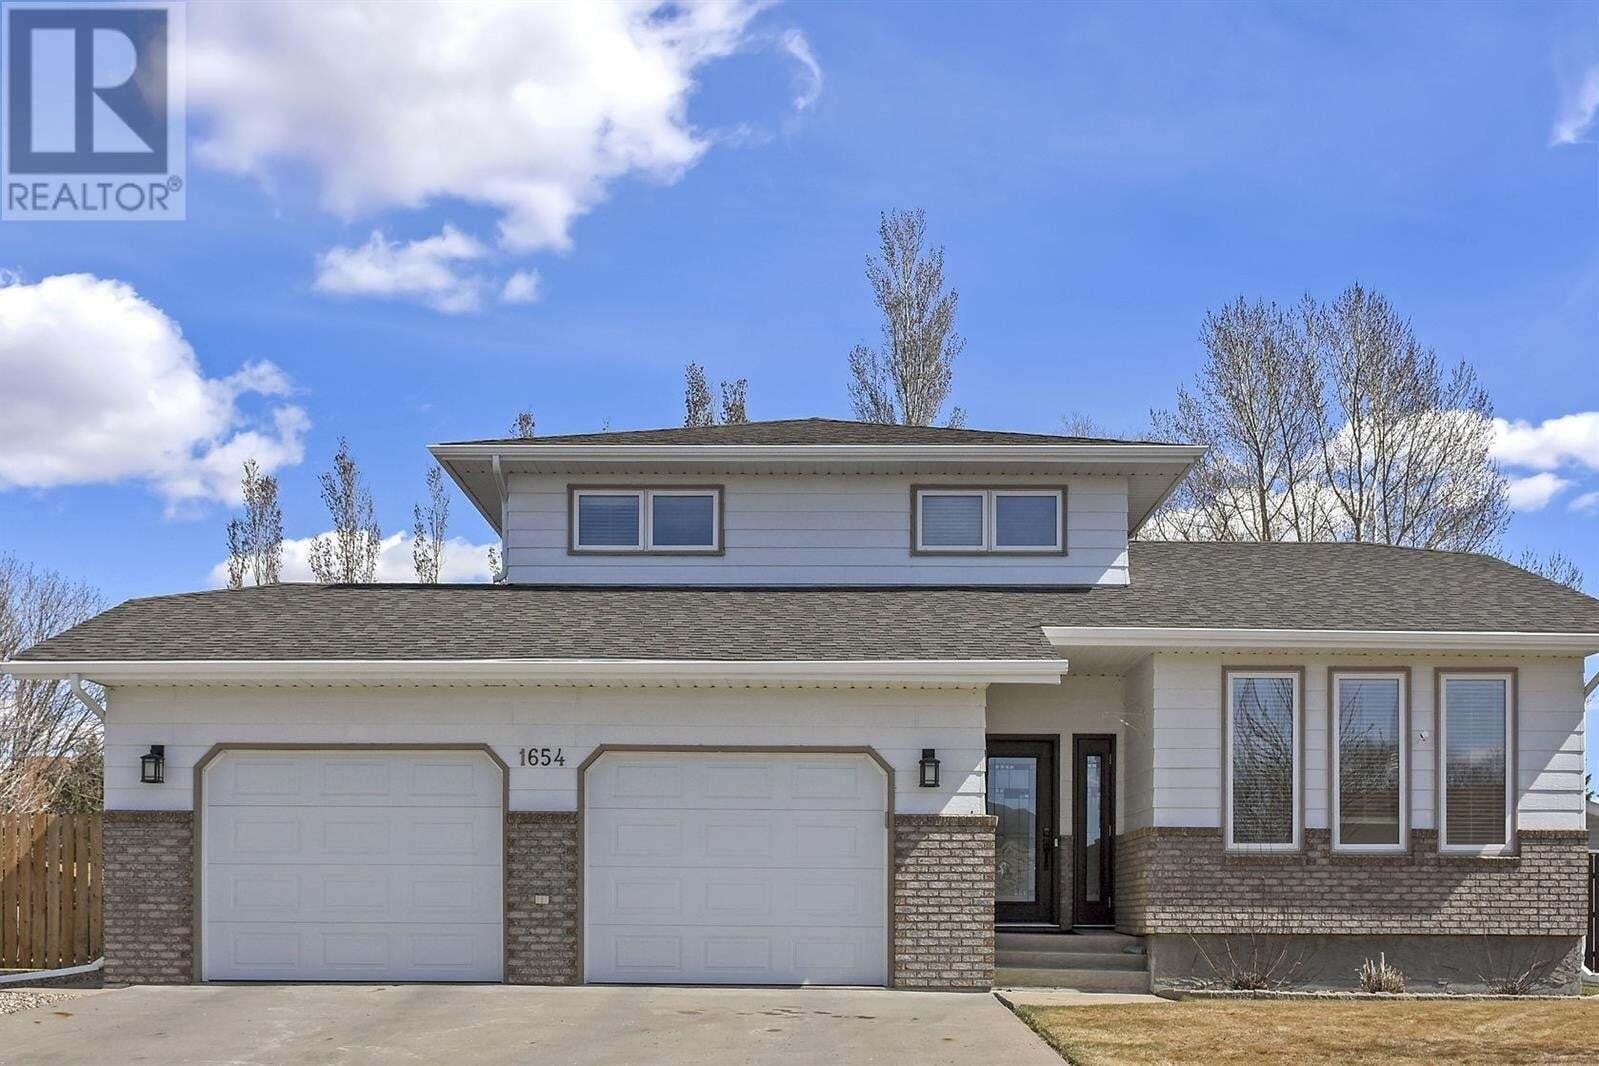 House for sale at 1654 Bingham Rd Moose Jaw Saskatchewan - MLS: SK827879